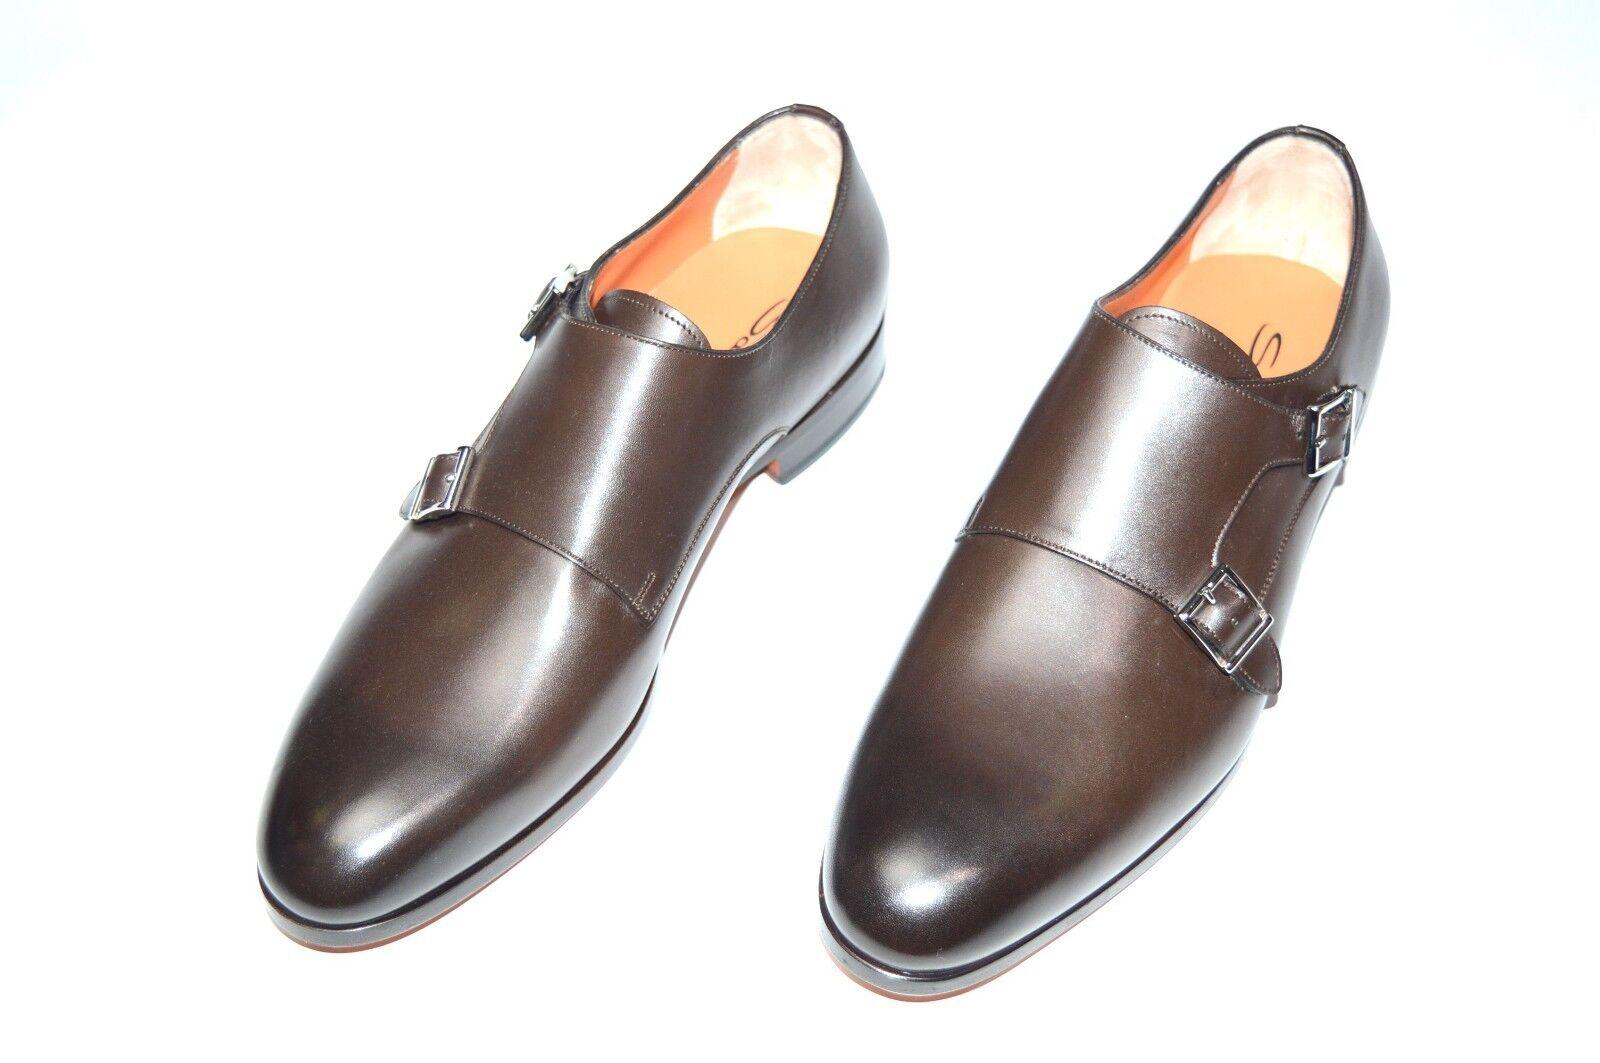 NEW SANTONI Dress Pelle Shoes Monk Strap SIZE Eu 40.5 Uk 6.5 Us 7.5 (18R)